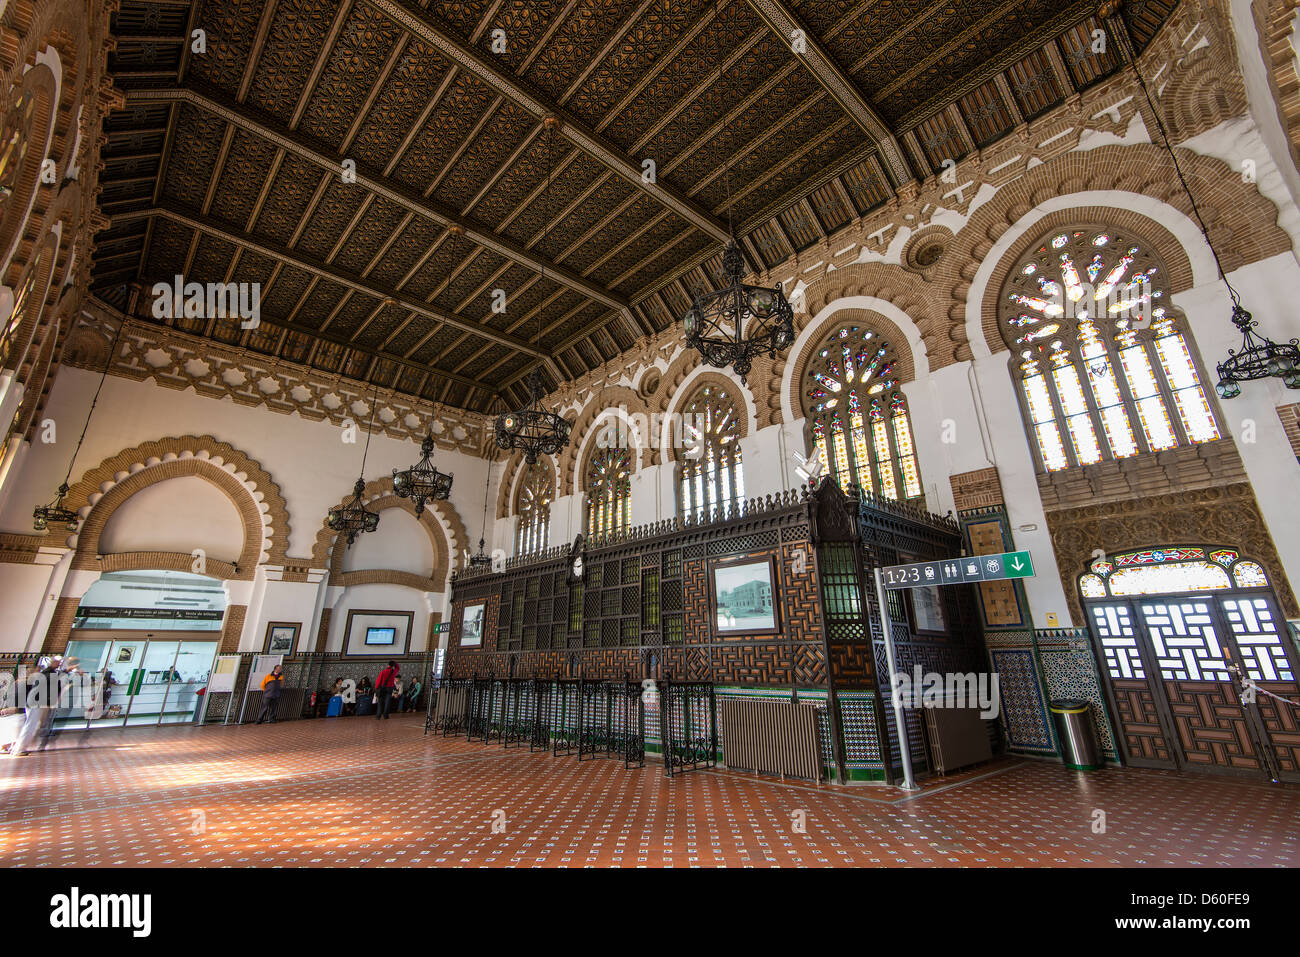 Interior of the railway station in Neo-Mudéjar style, Toledo, Castile La Mancha, Spain - Stock Image